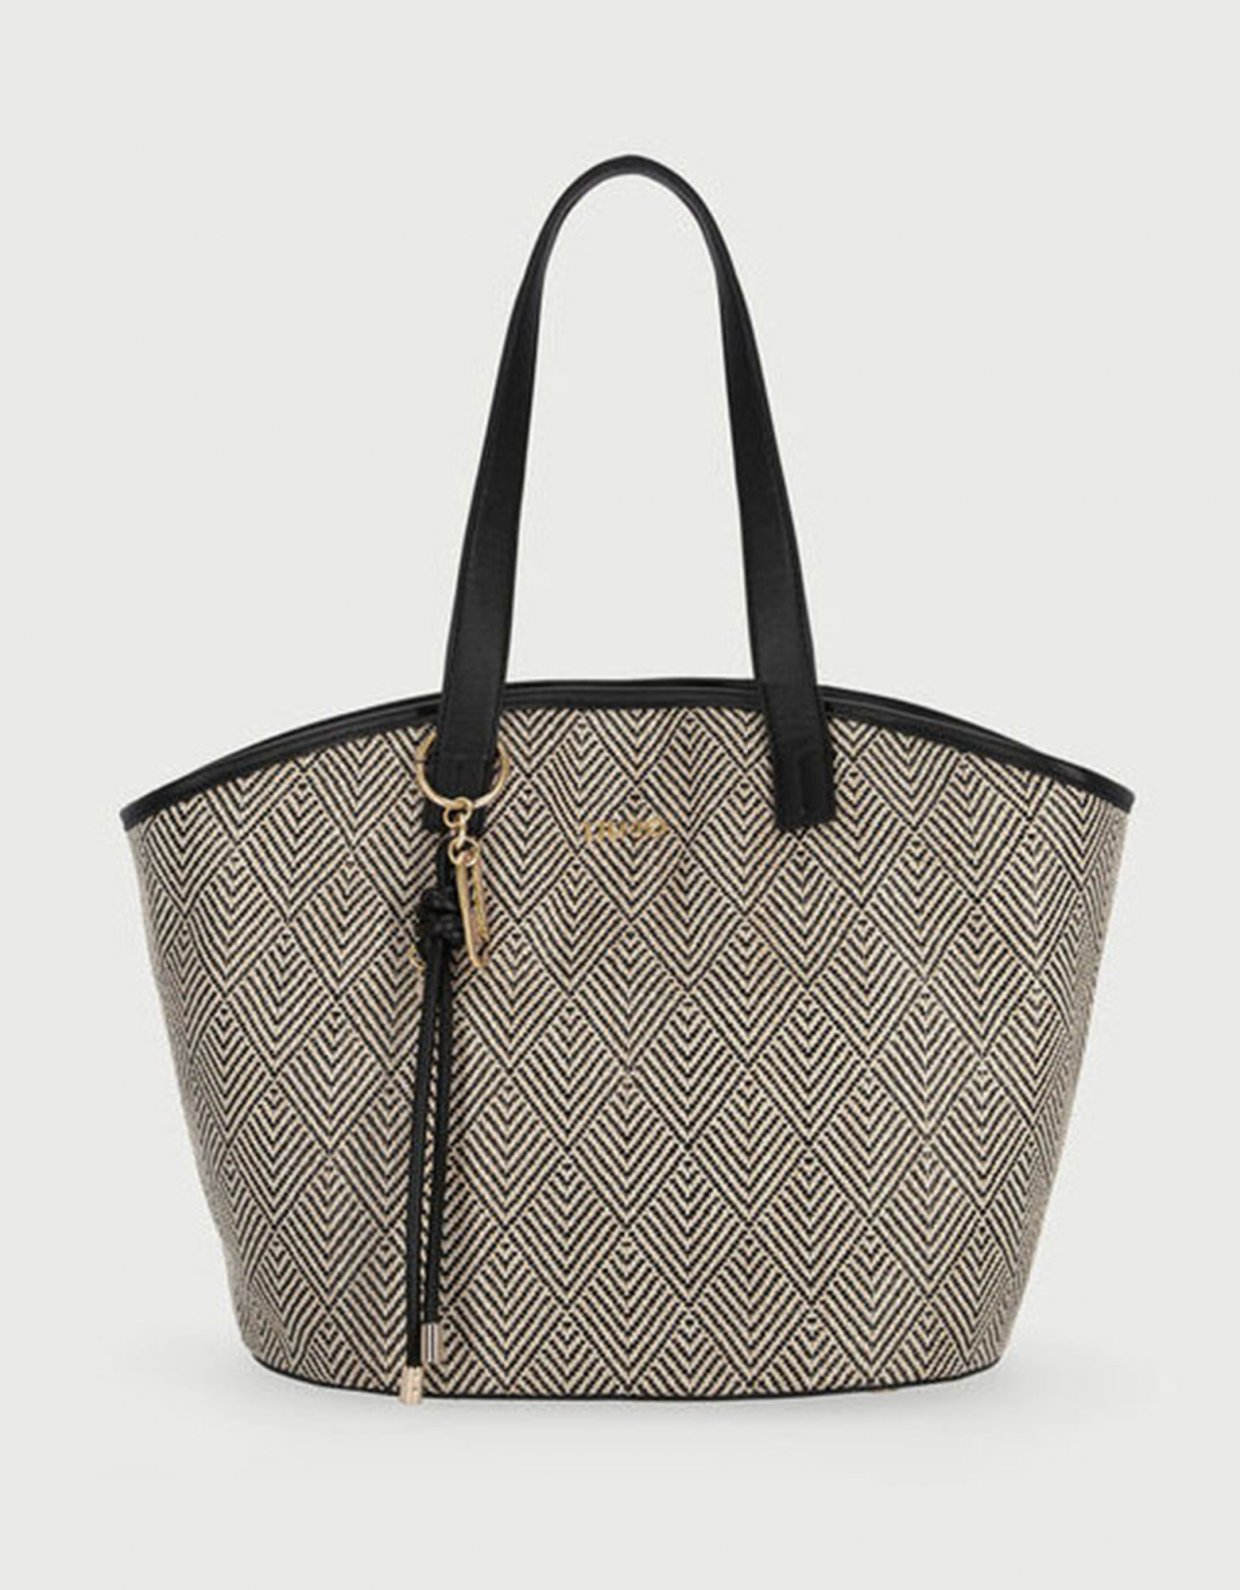 Liu Jo Shopping bag with charm